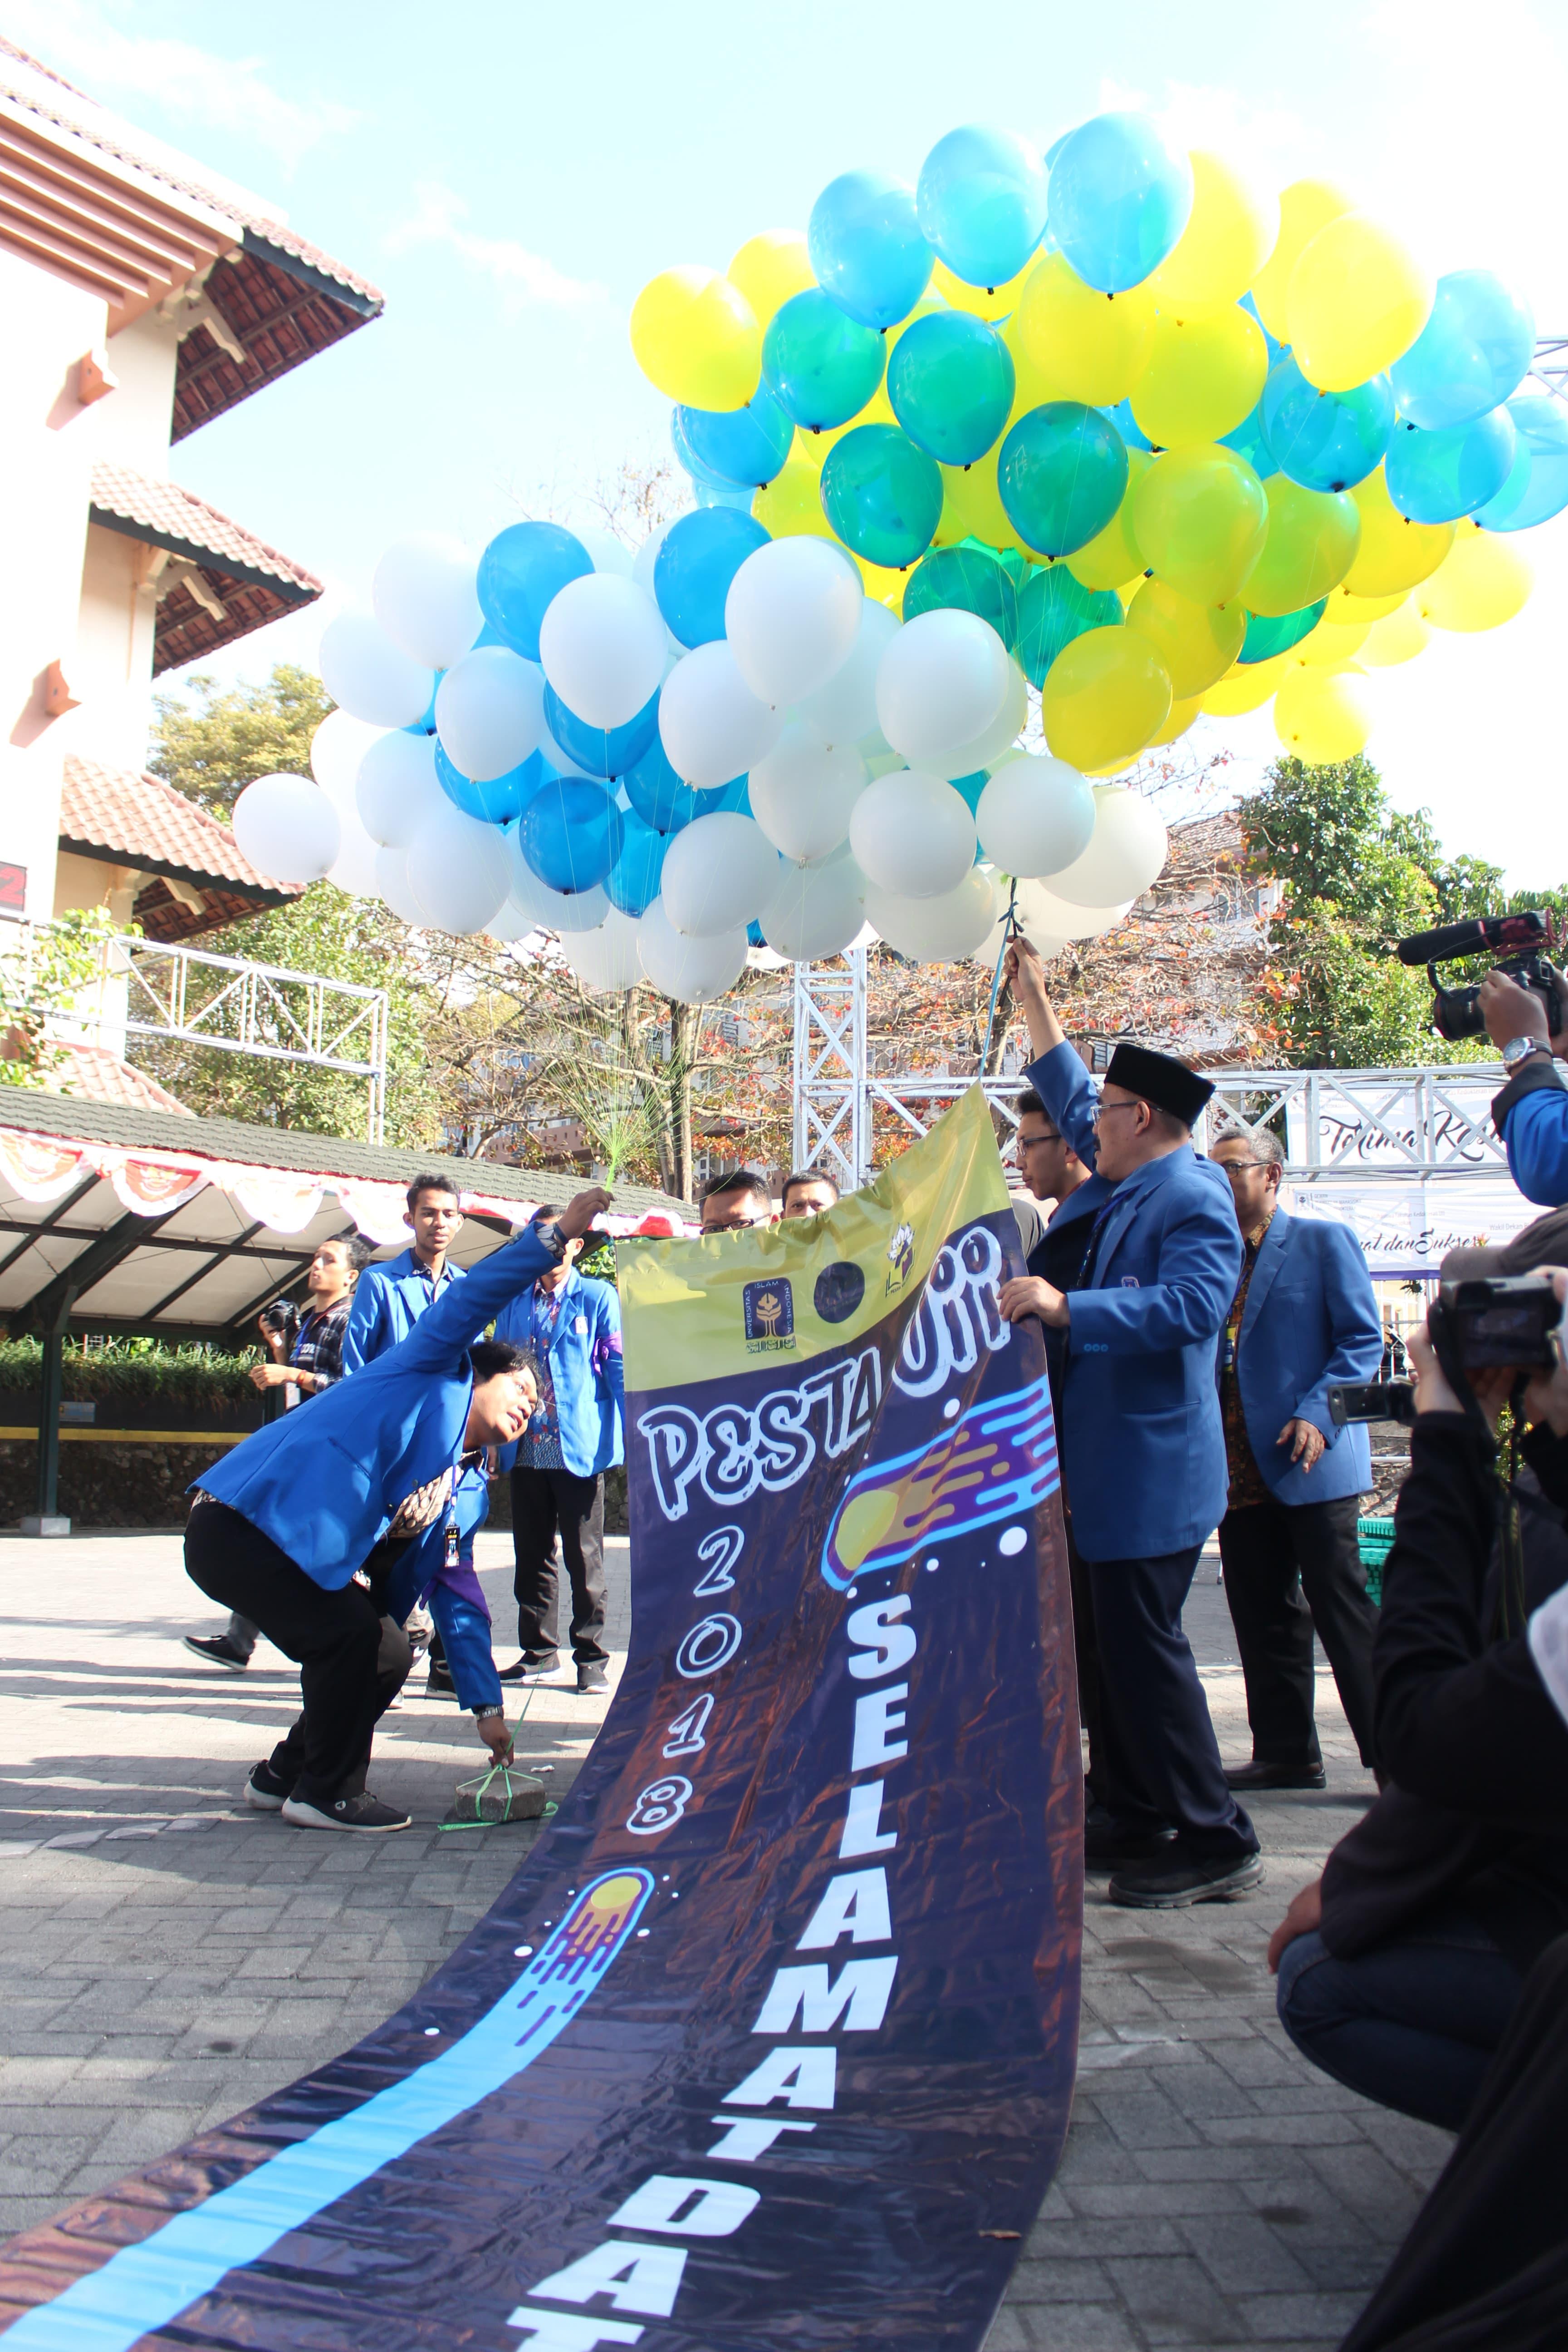 Pelepasan Balon berwarna putih, biru dan kuning sebagai warna yang menyimbolkan UII dalam rangka penyambutan terhadap mahasiswa baru. (Foto : Rintan/Ekonomika)